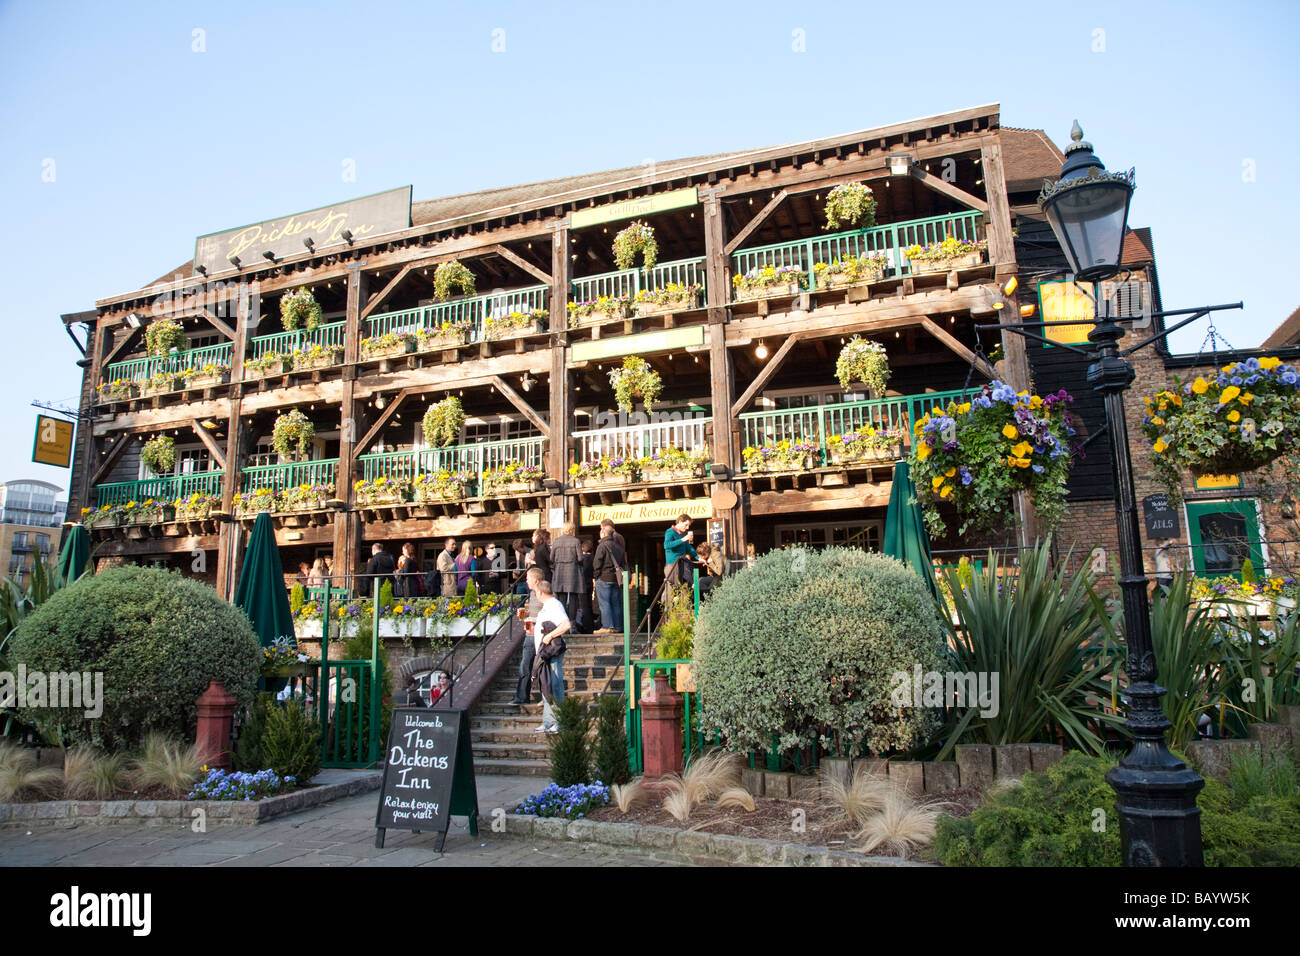 The Dickens Inn, Pub St Katharine Docks, London UK England - Stock Image